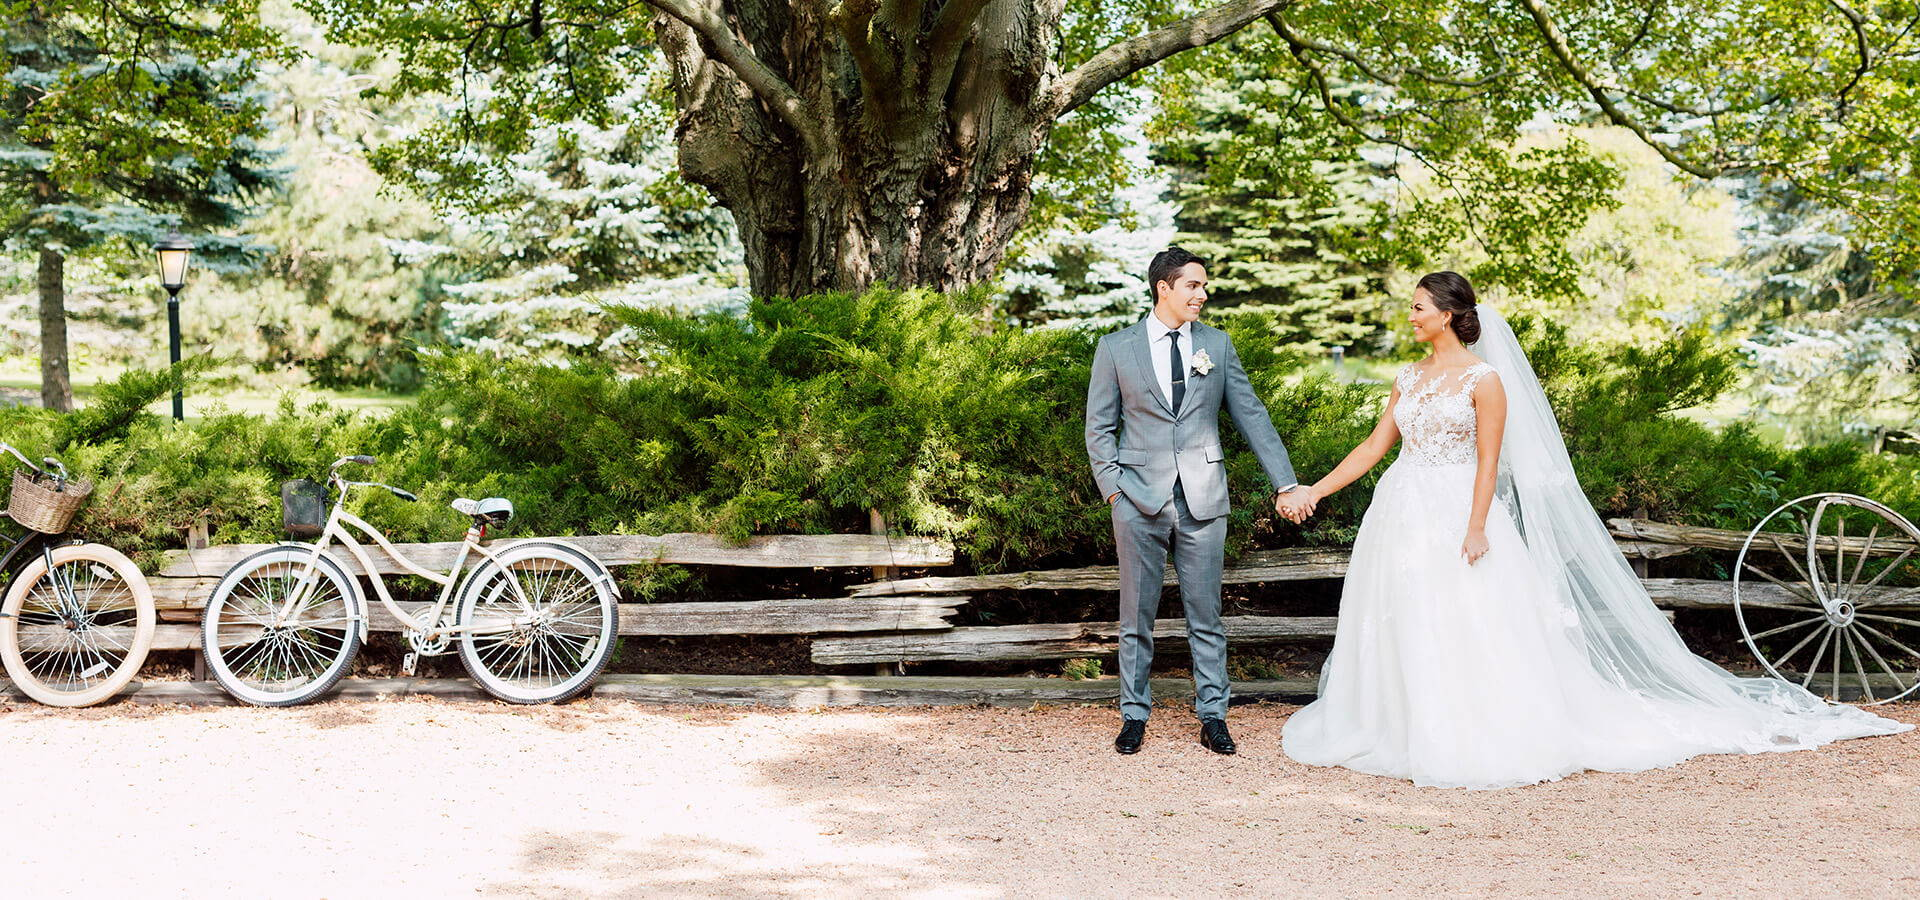 Hero image for Veronica and Daniel's Whimsical Vintage Garden Wedding at Belcroft Estates